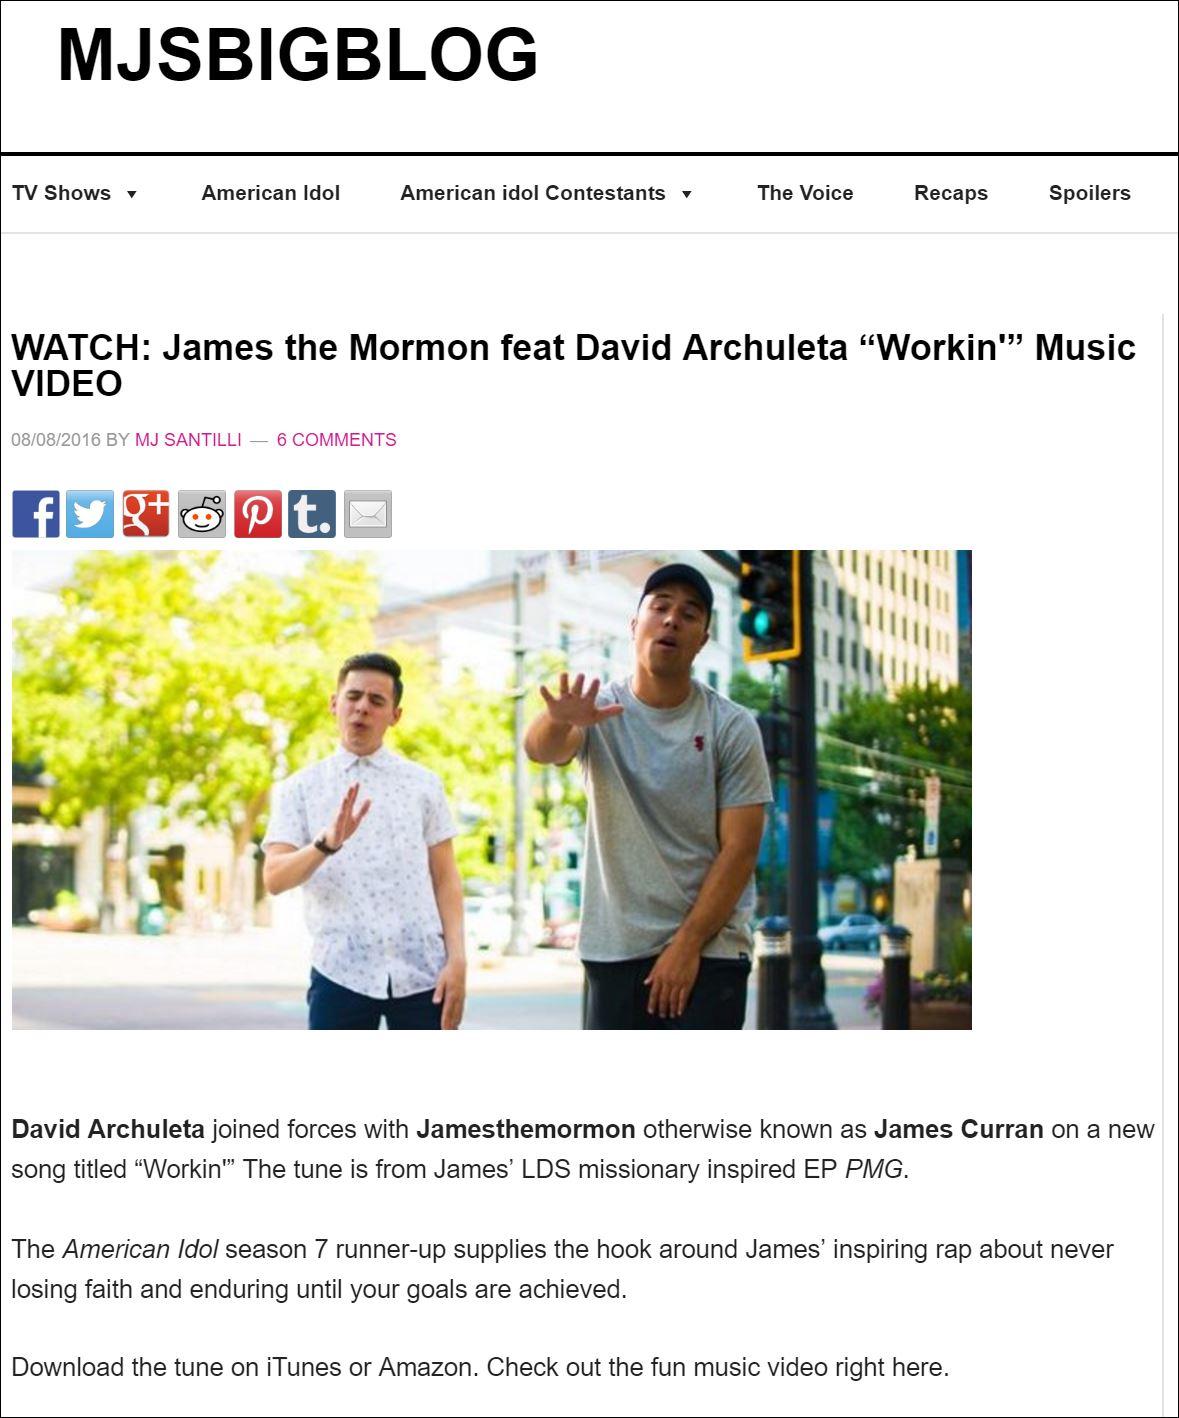 mjs big blog workin - Fans of David ArchuletaFans of David Archuleta